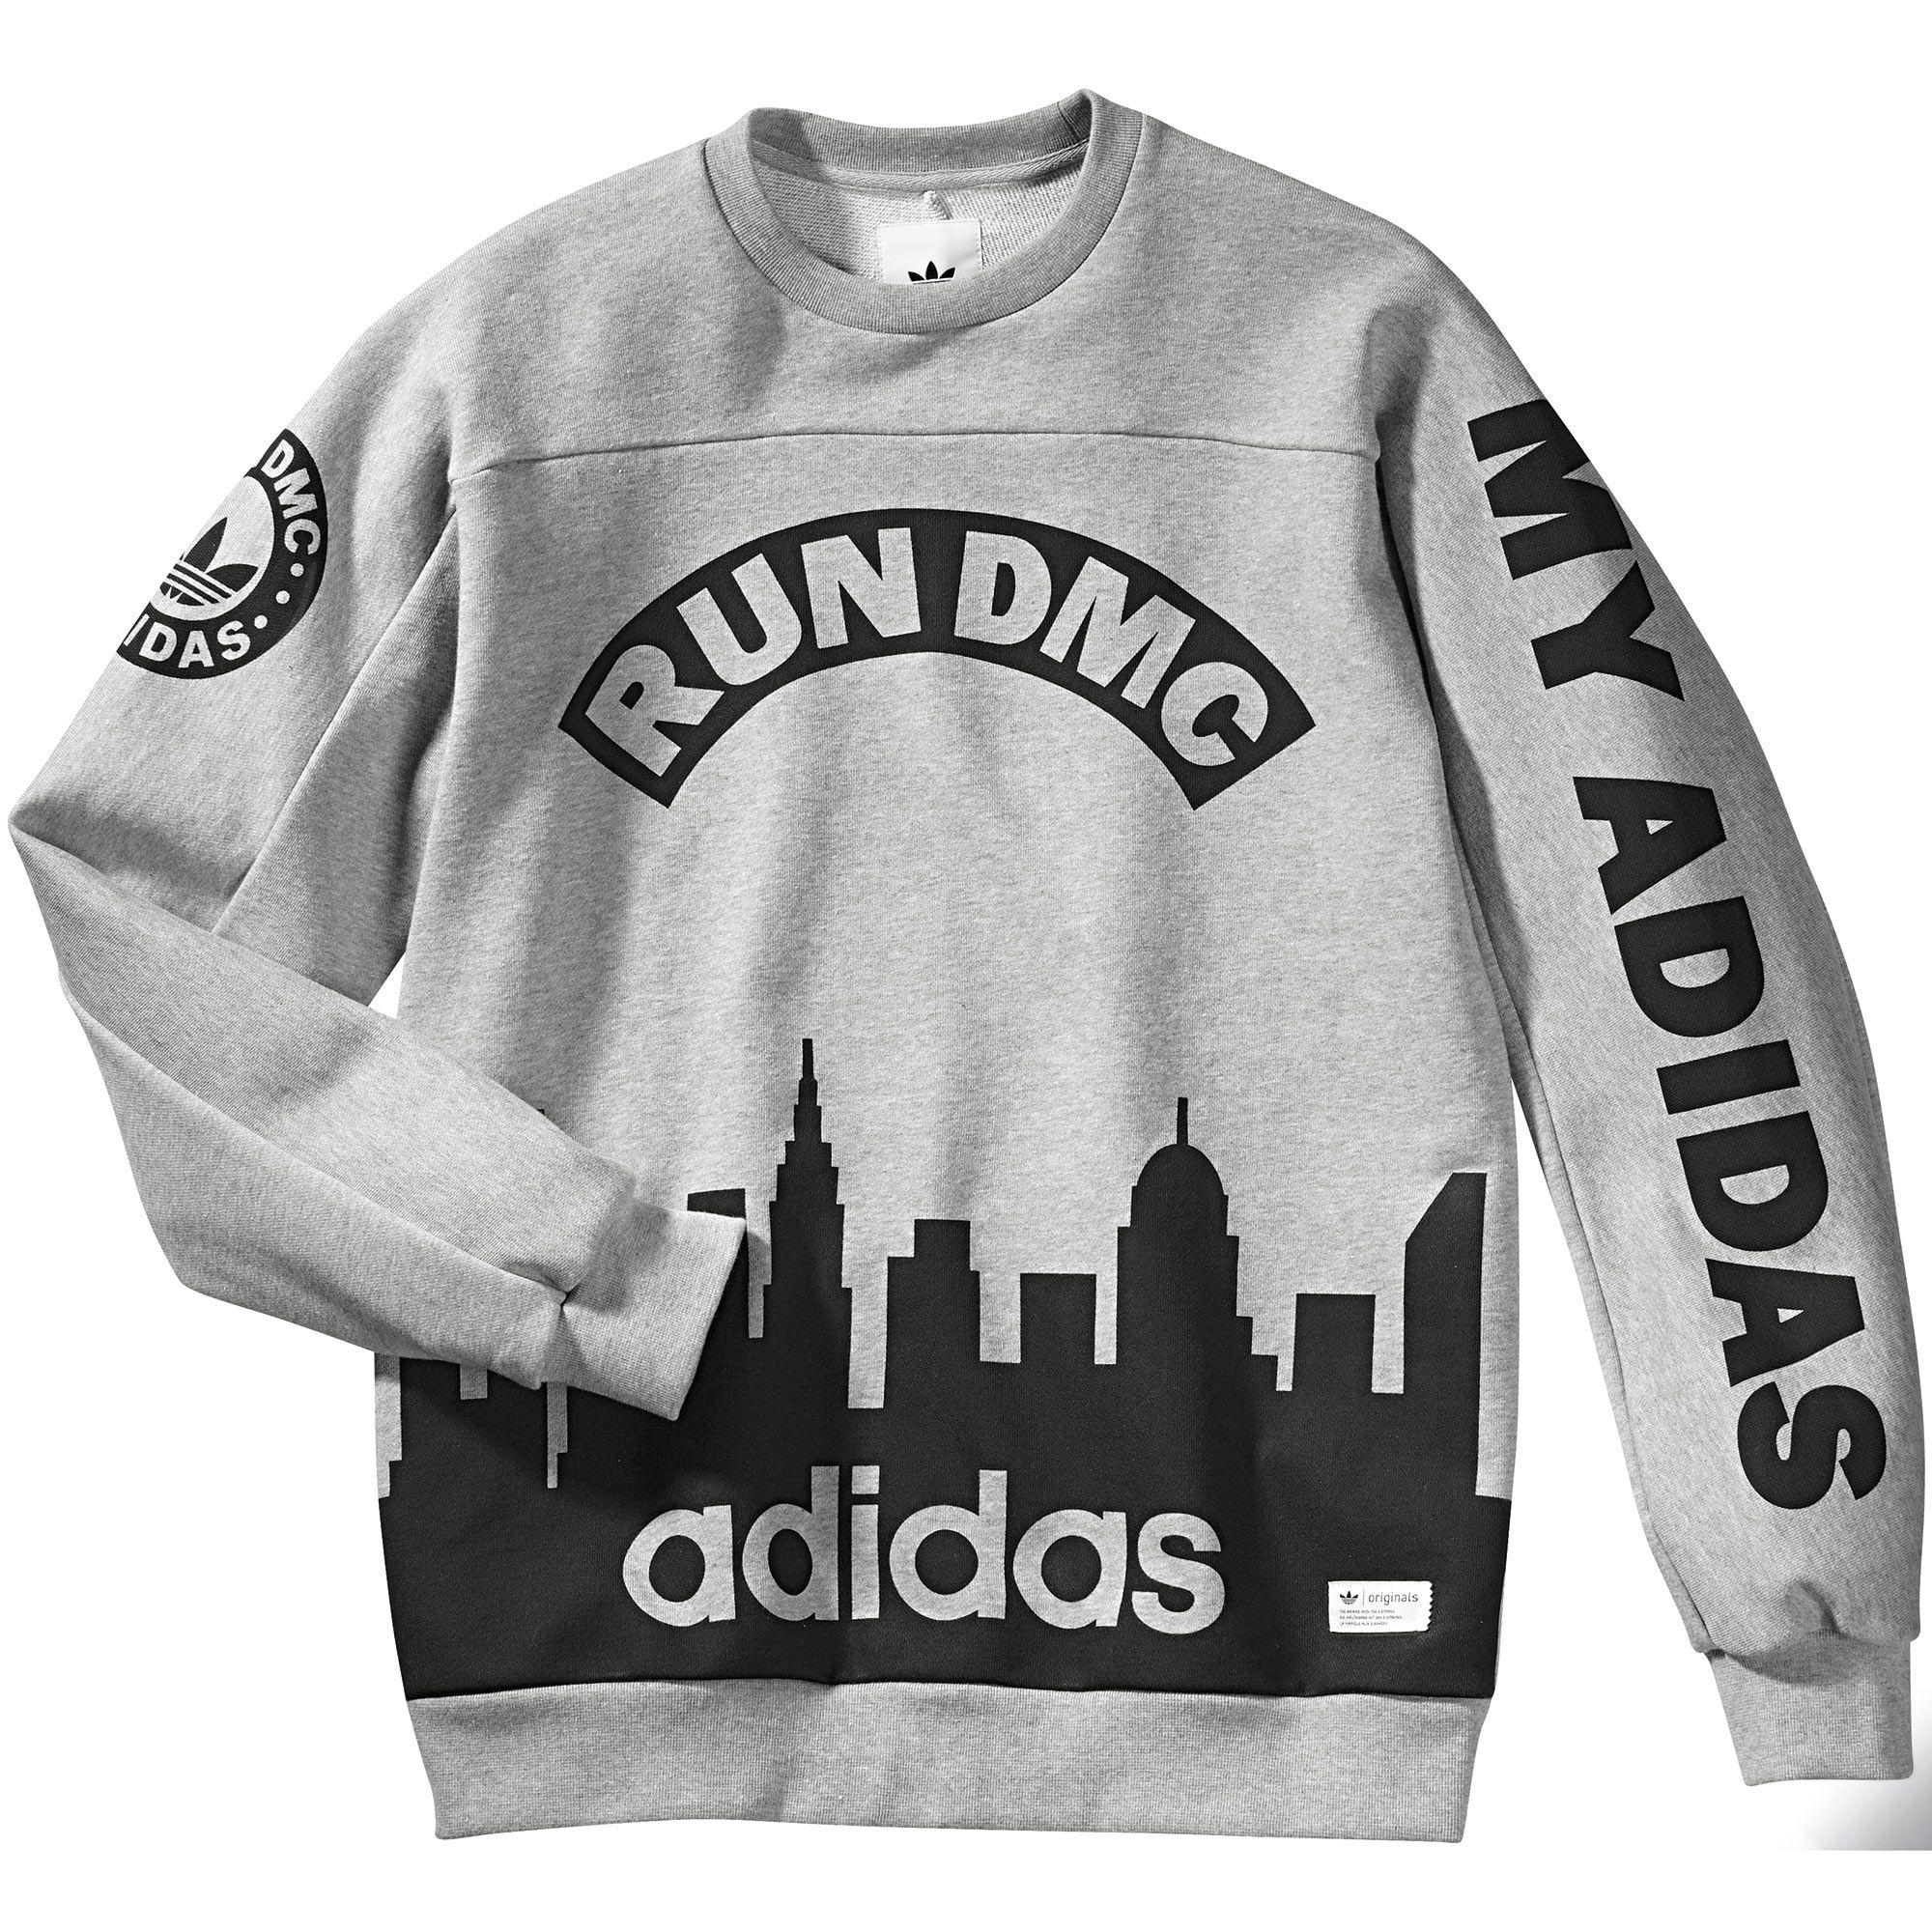 Adidas Suéter Run DMC  ba1ff0bd22801